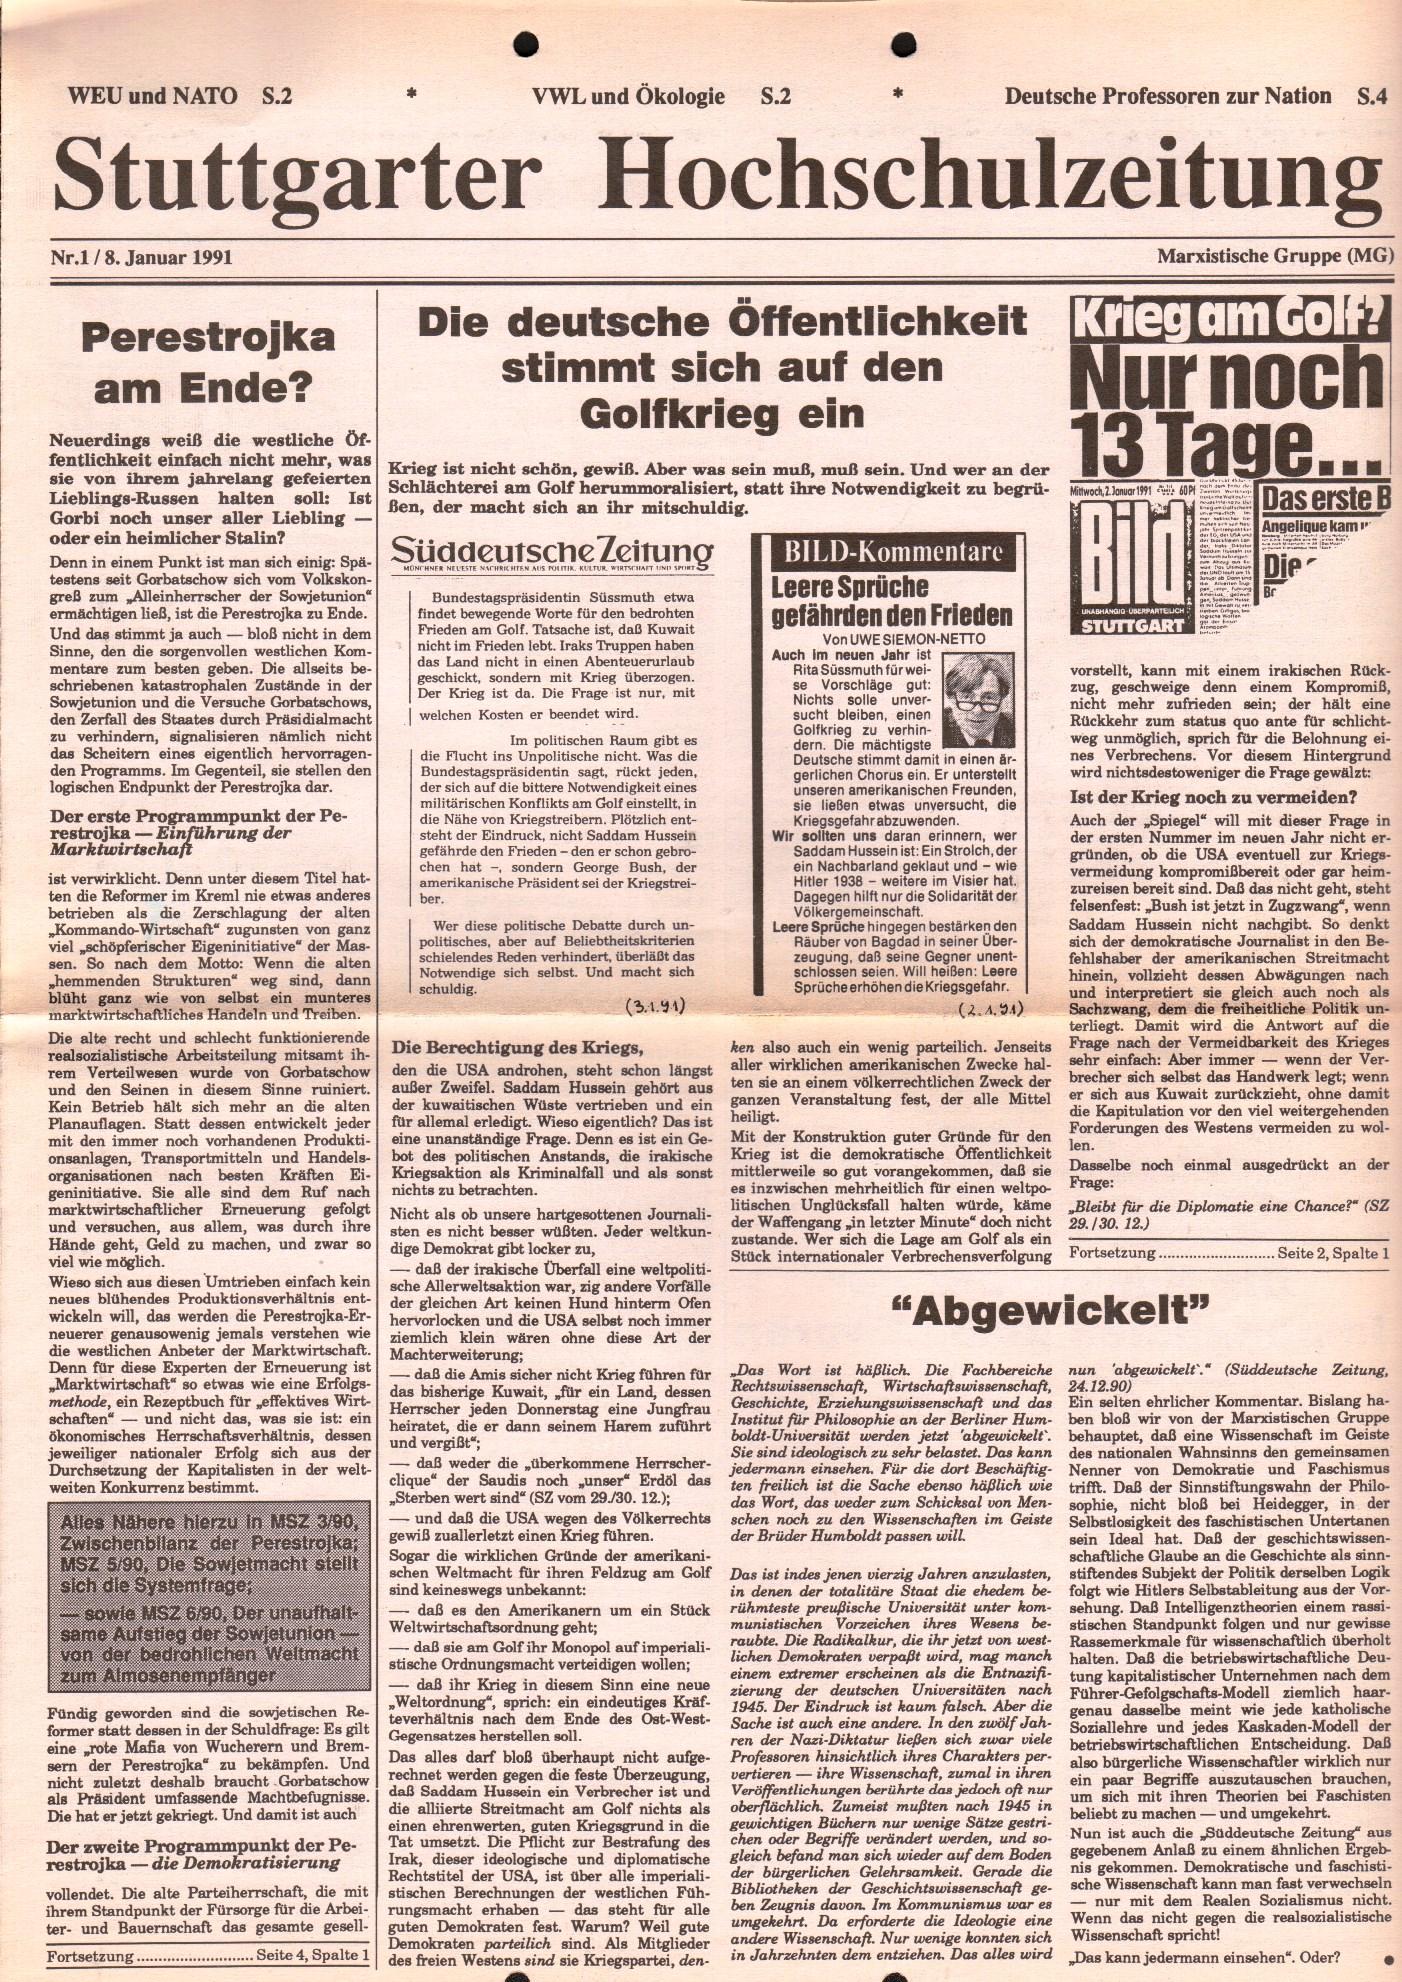 Stuttgart_MG_Hochschulzeitung_1991_01_01